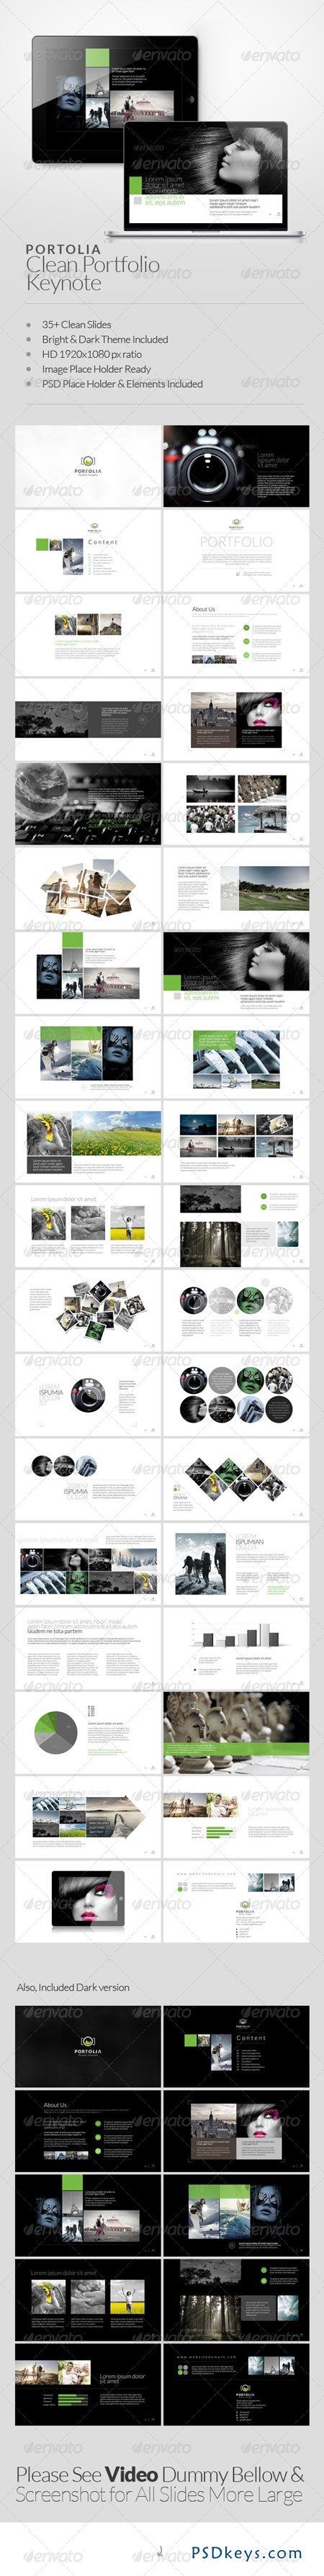 Portolia Multipurpose Clean Portfolio Keynote 6452302